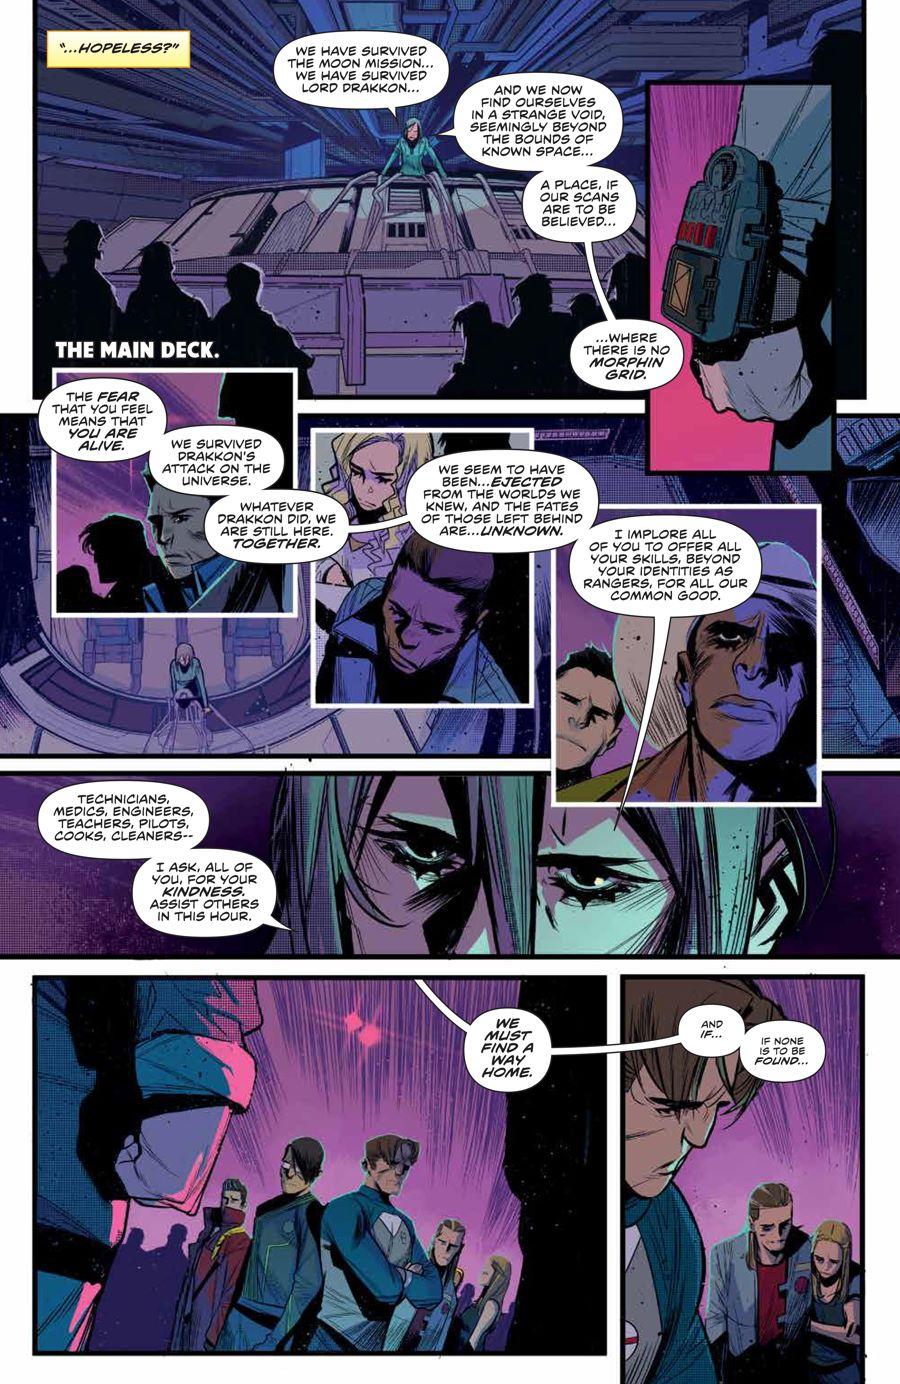 MMPR_BeyondGrid_SC_PRESS_17 ComicList Previews: MIGHTY MORPHIN POWER RANGERS BEYOND THE GRID TP